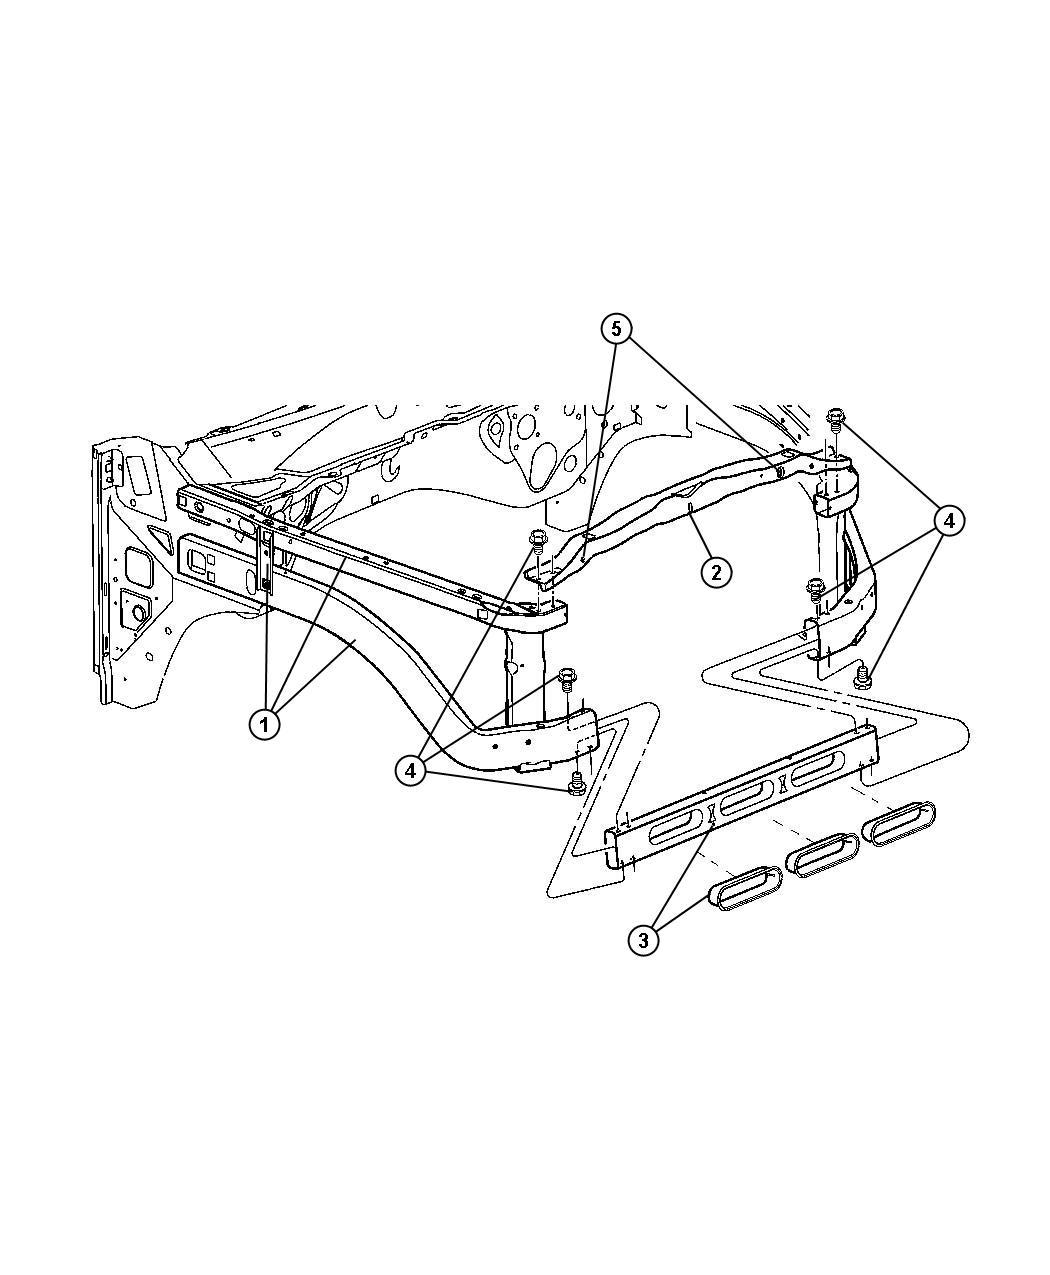 Dodge Ram Crossmember Radiator Lower Closer